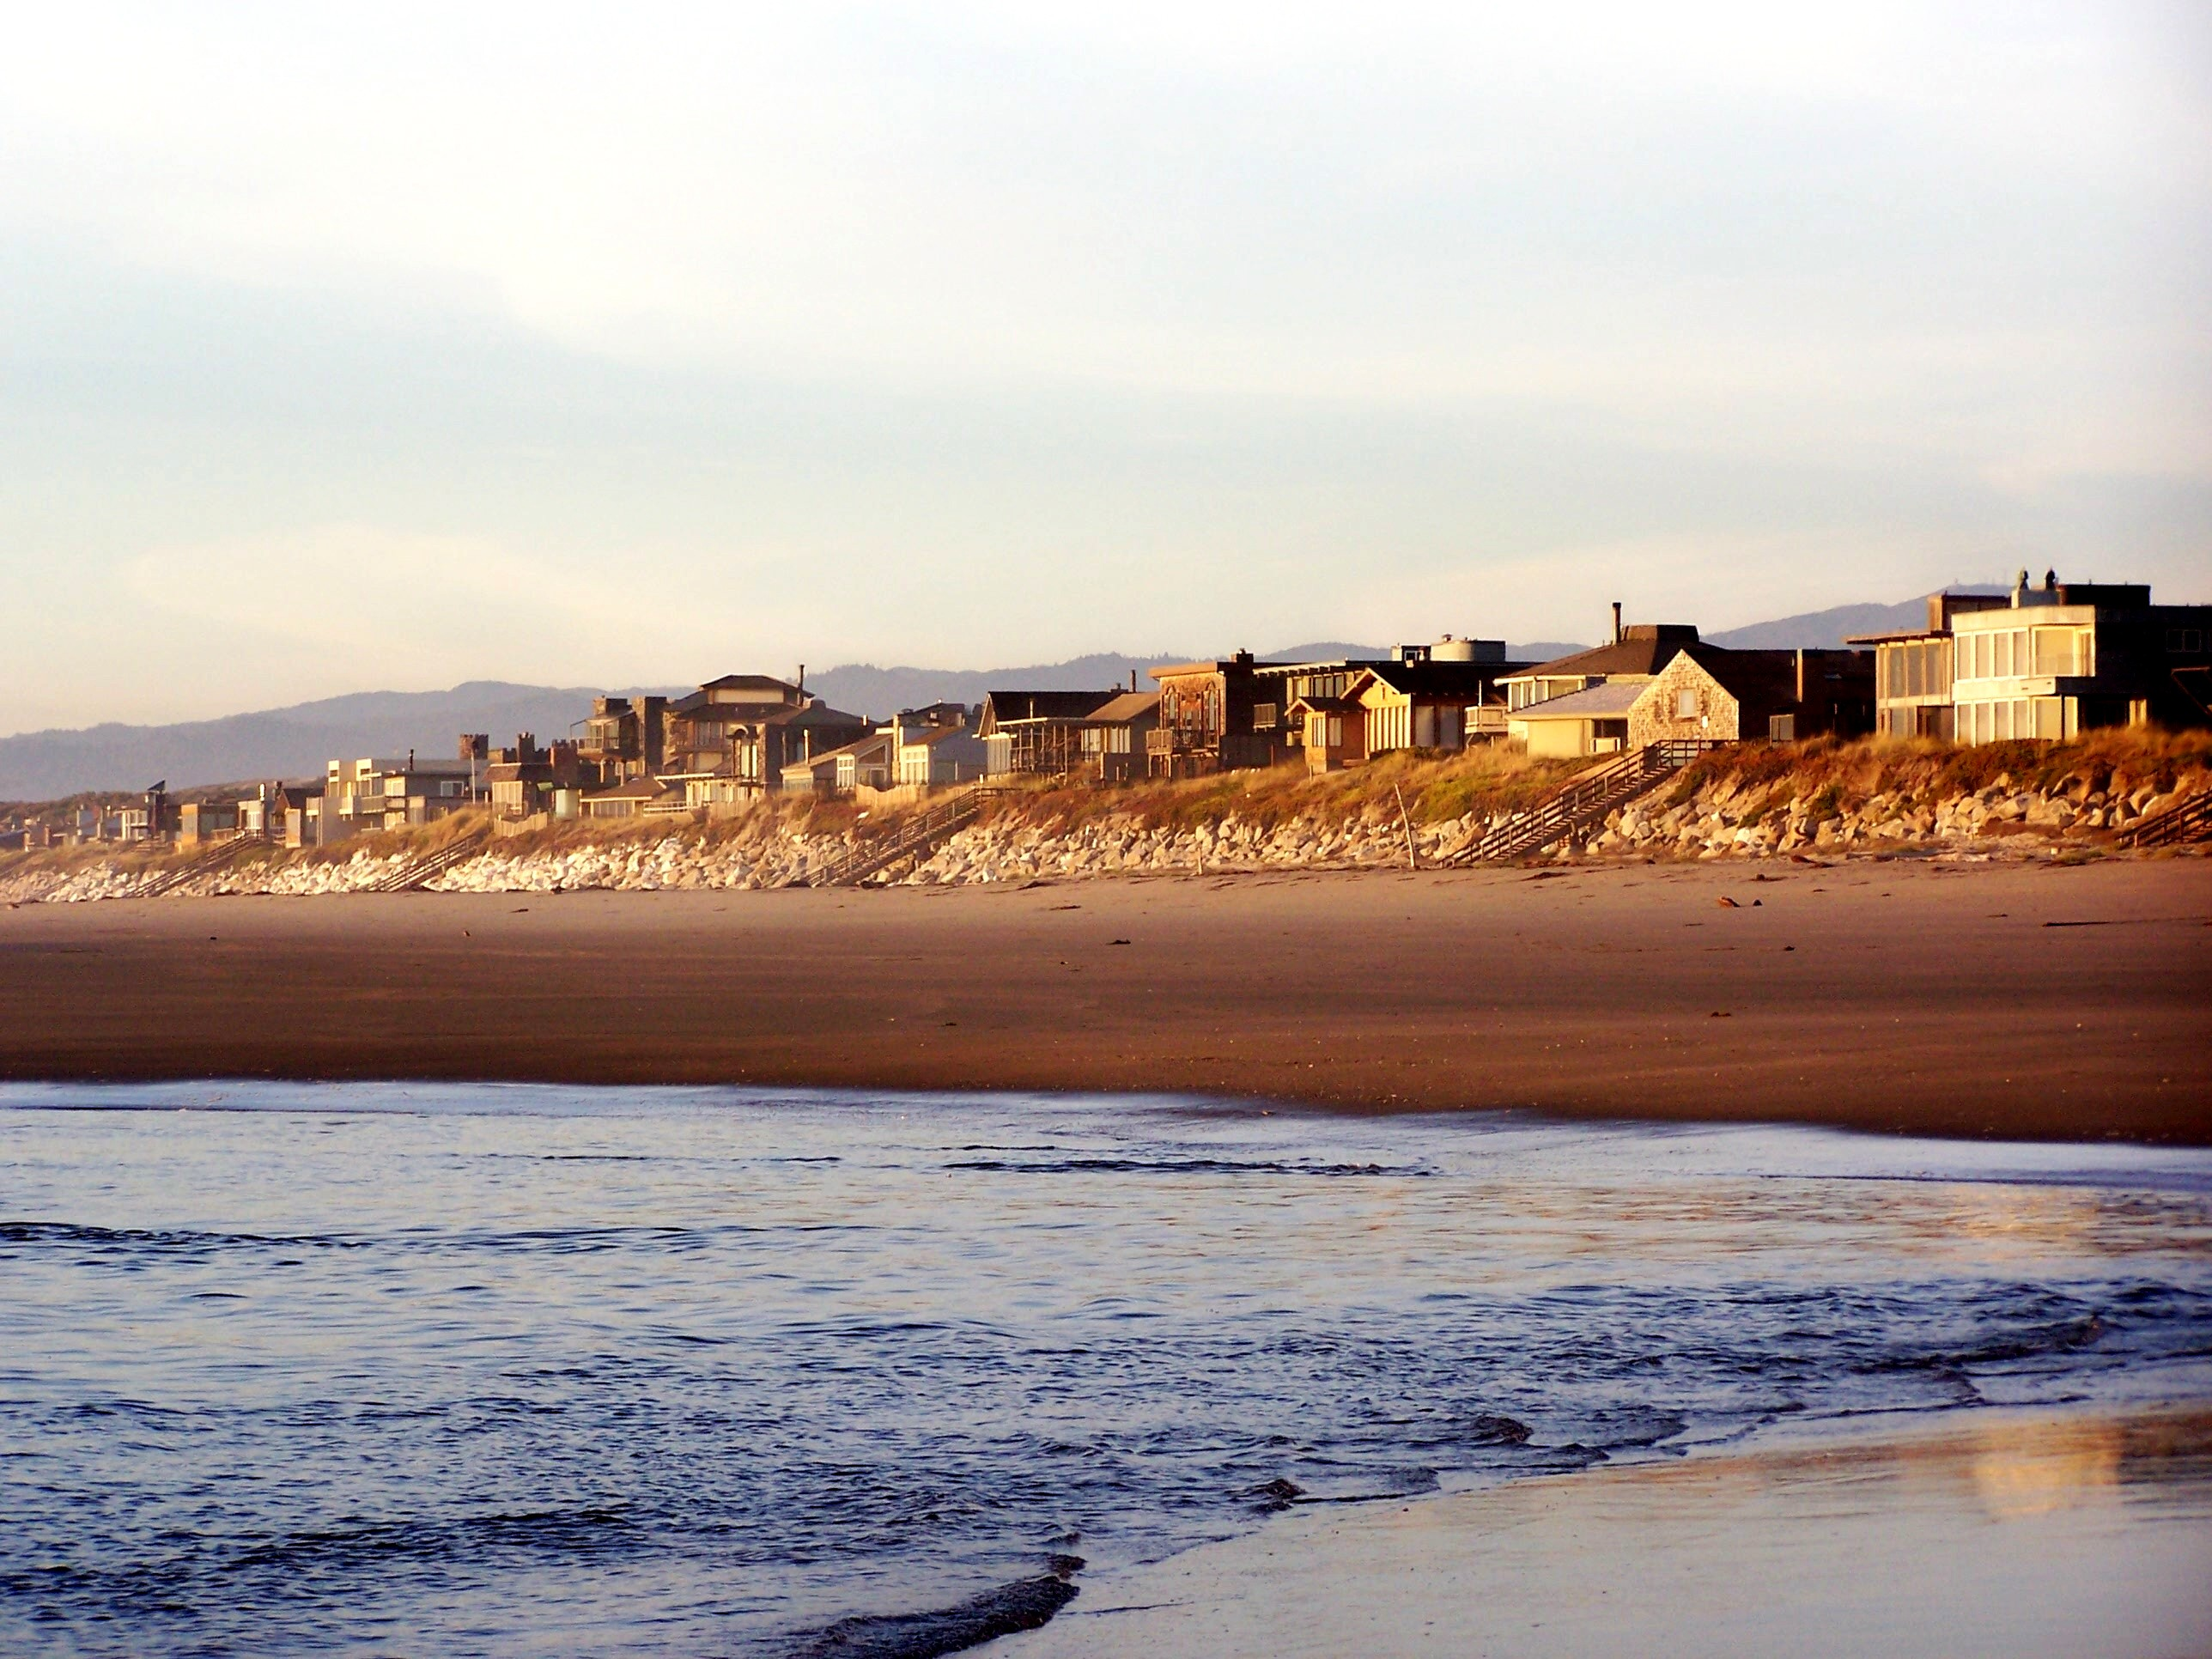 Pajaro Dunes Company and Resort image 0